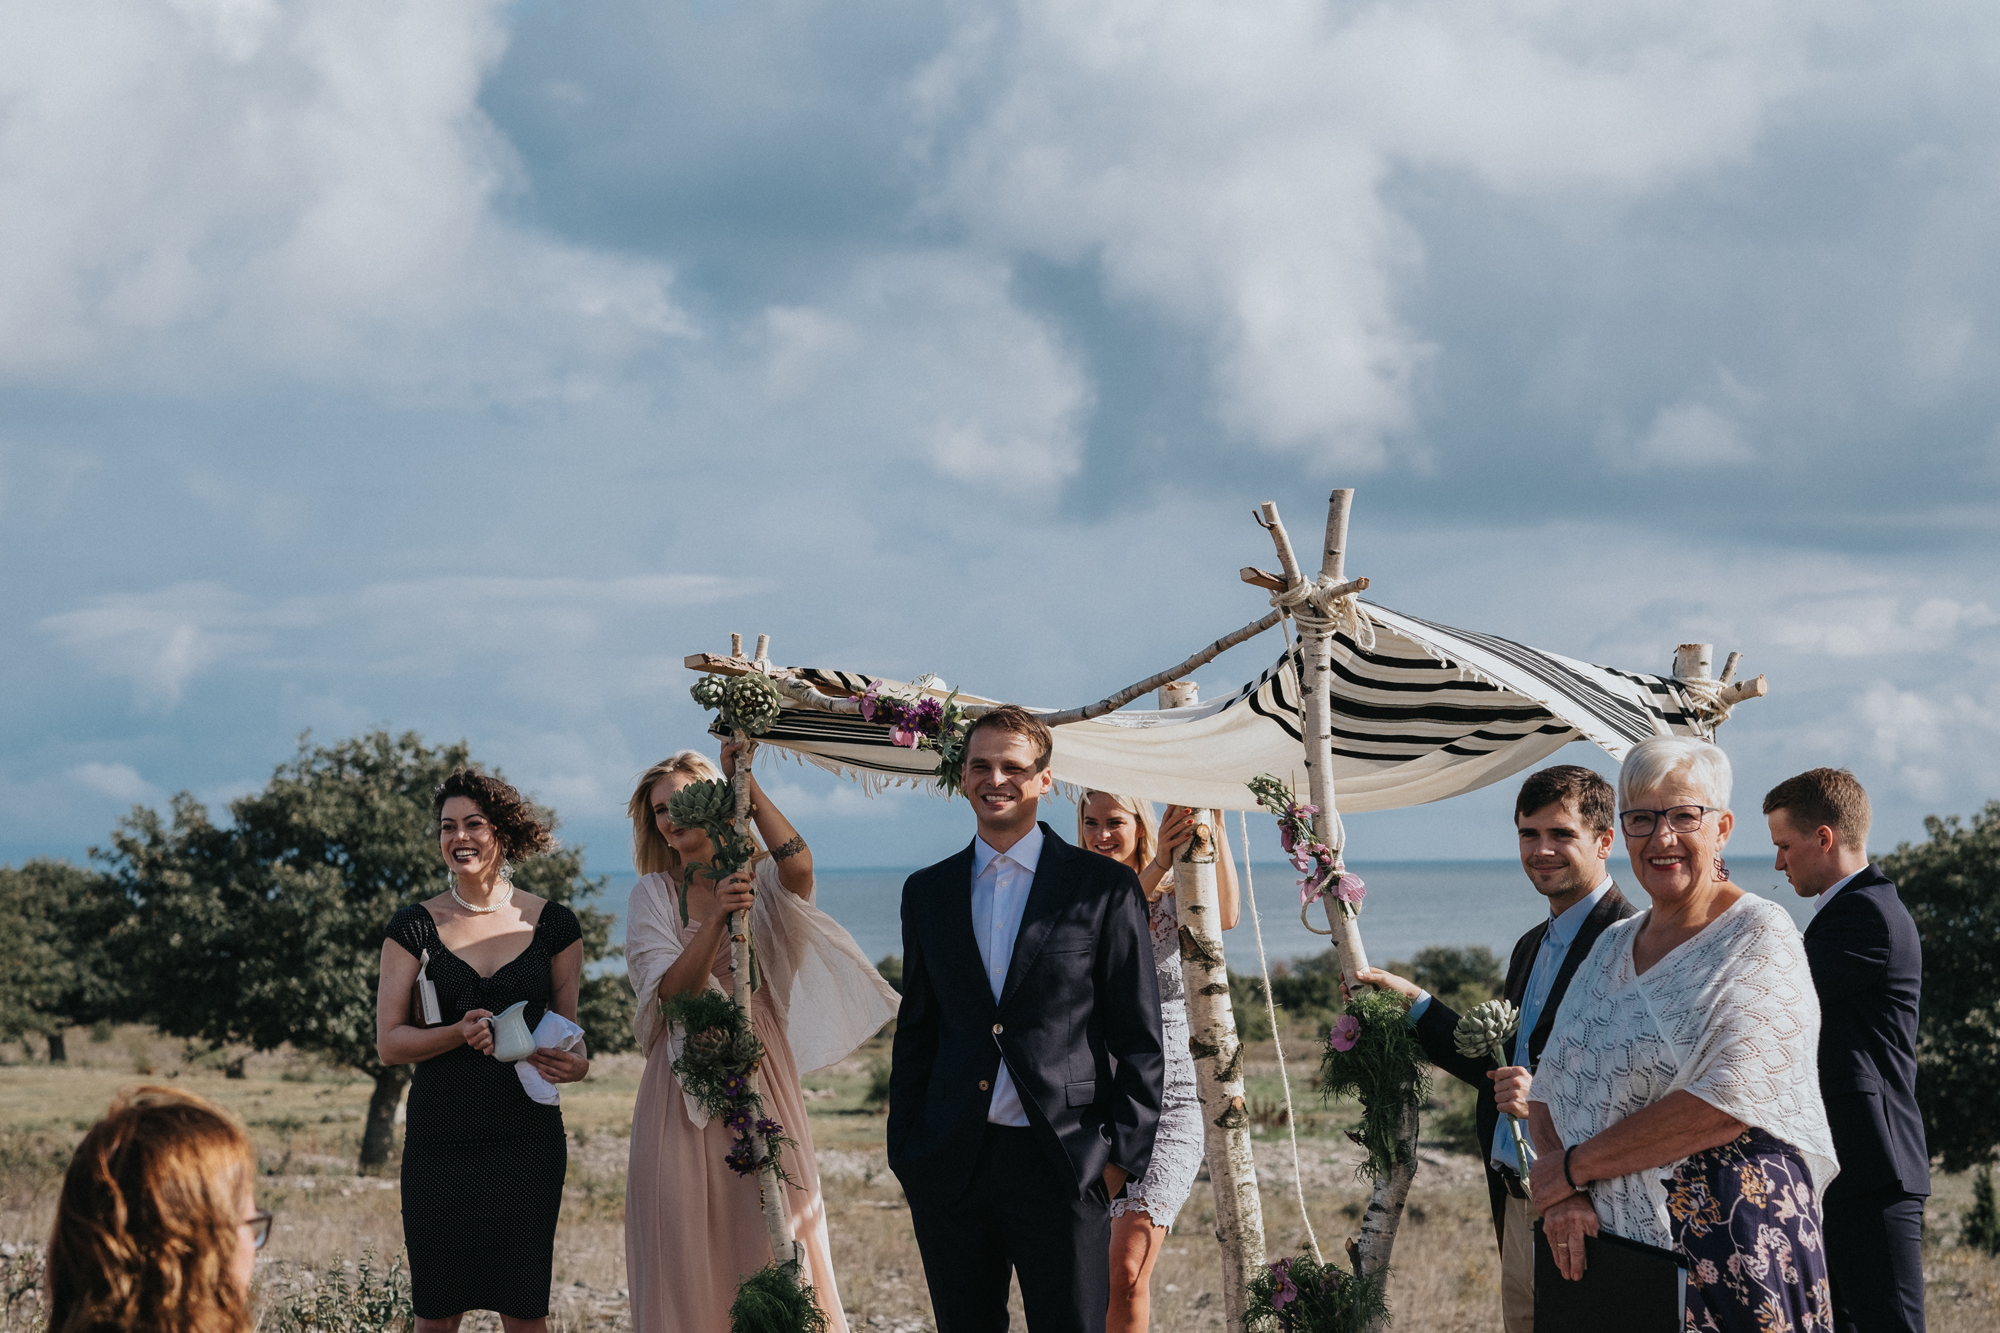 012-bröllop-stora-gåsemora-neas-fotografi.jpg